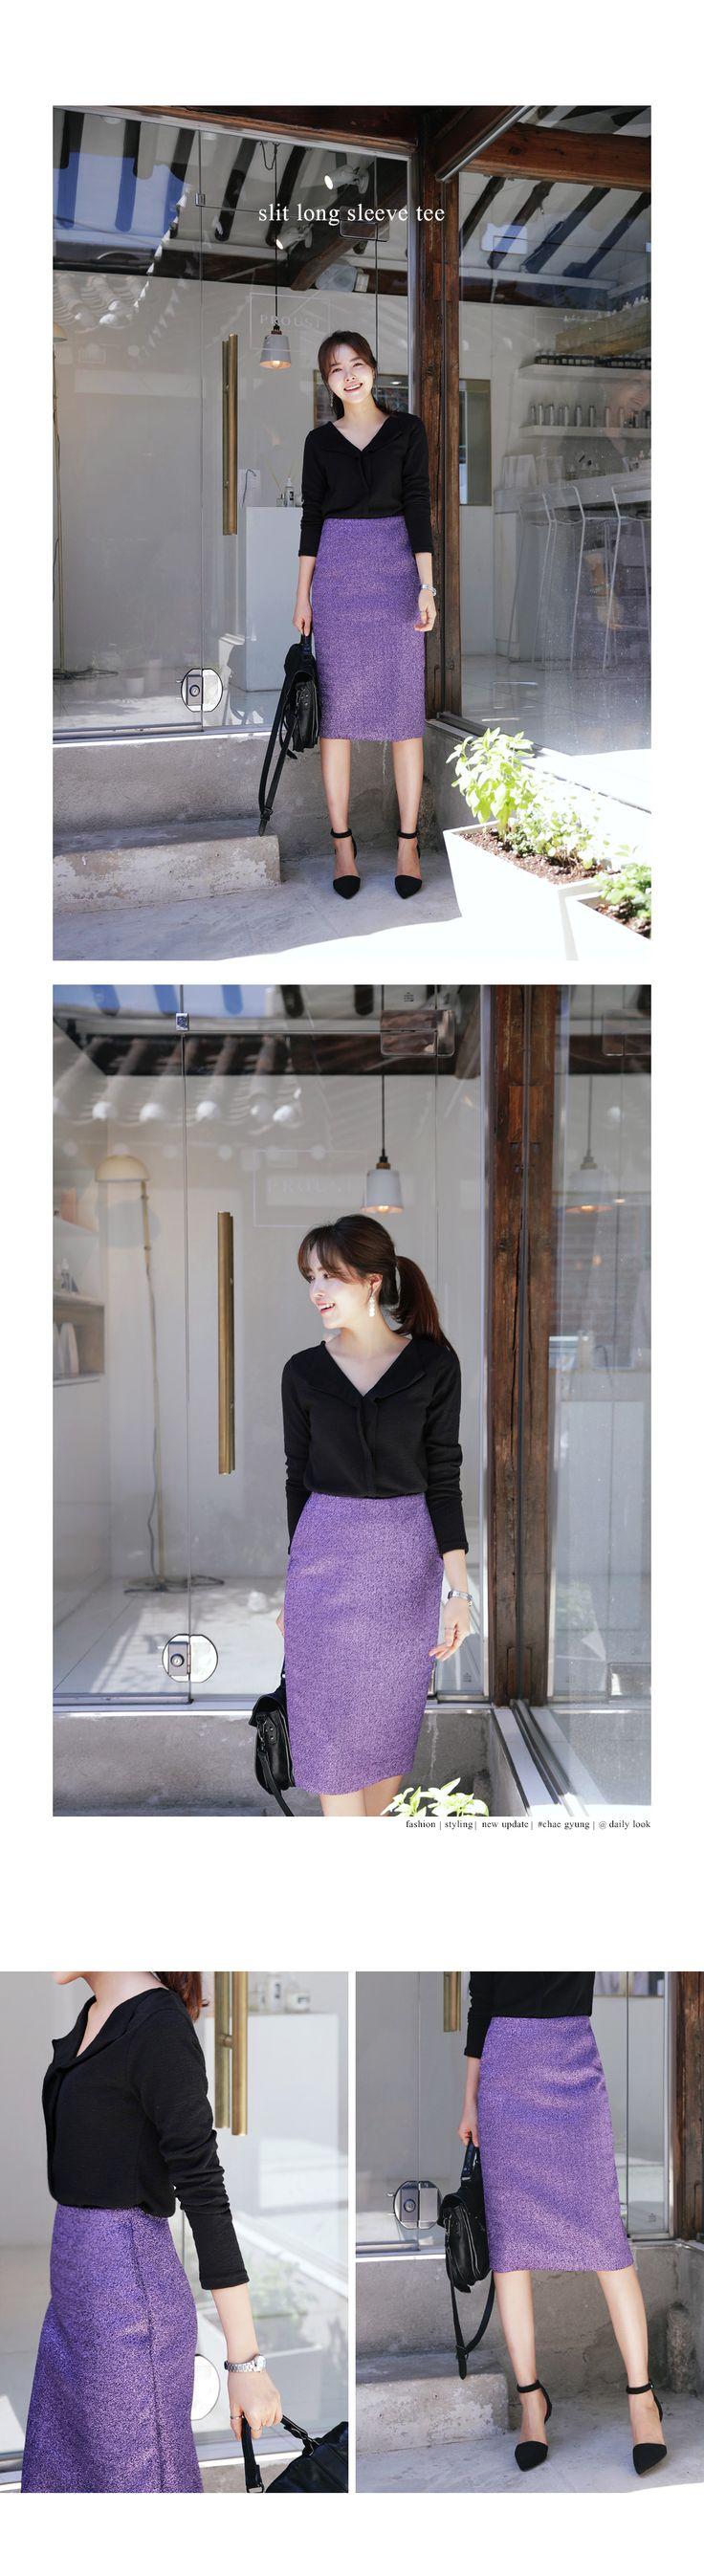 VネックスリットTシャツ・全4色トップス・カットソーカットソー・Tシャツ レディースファッション通販 DHOLICディーホリック [ファストファッション 水着 ワンピース]